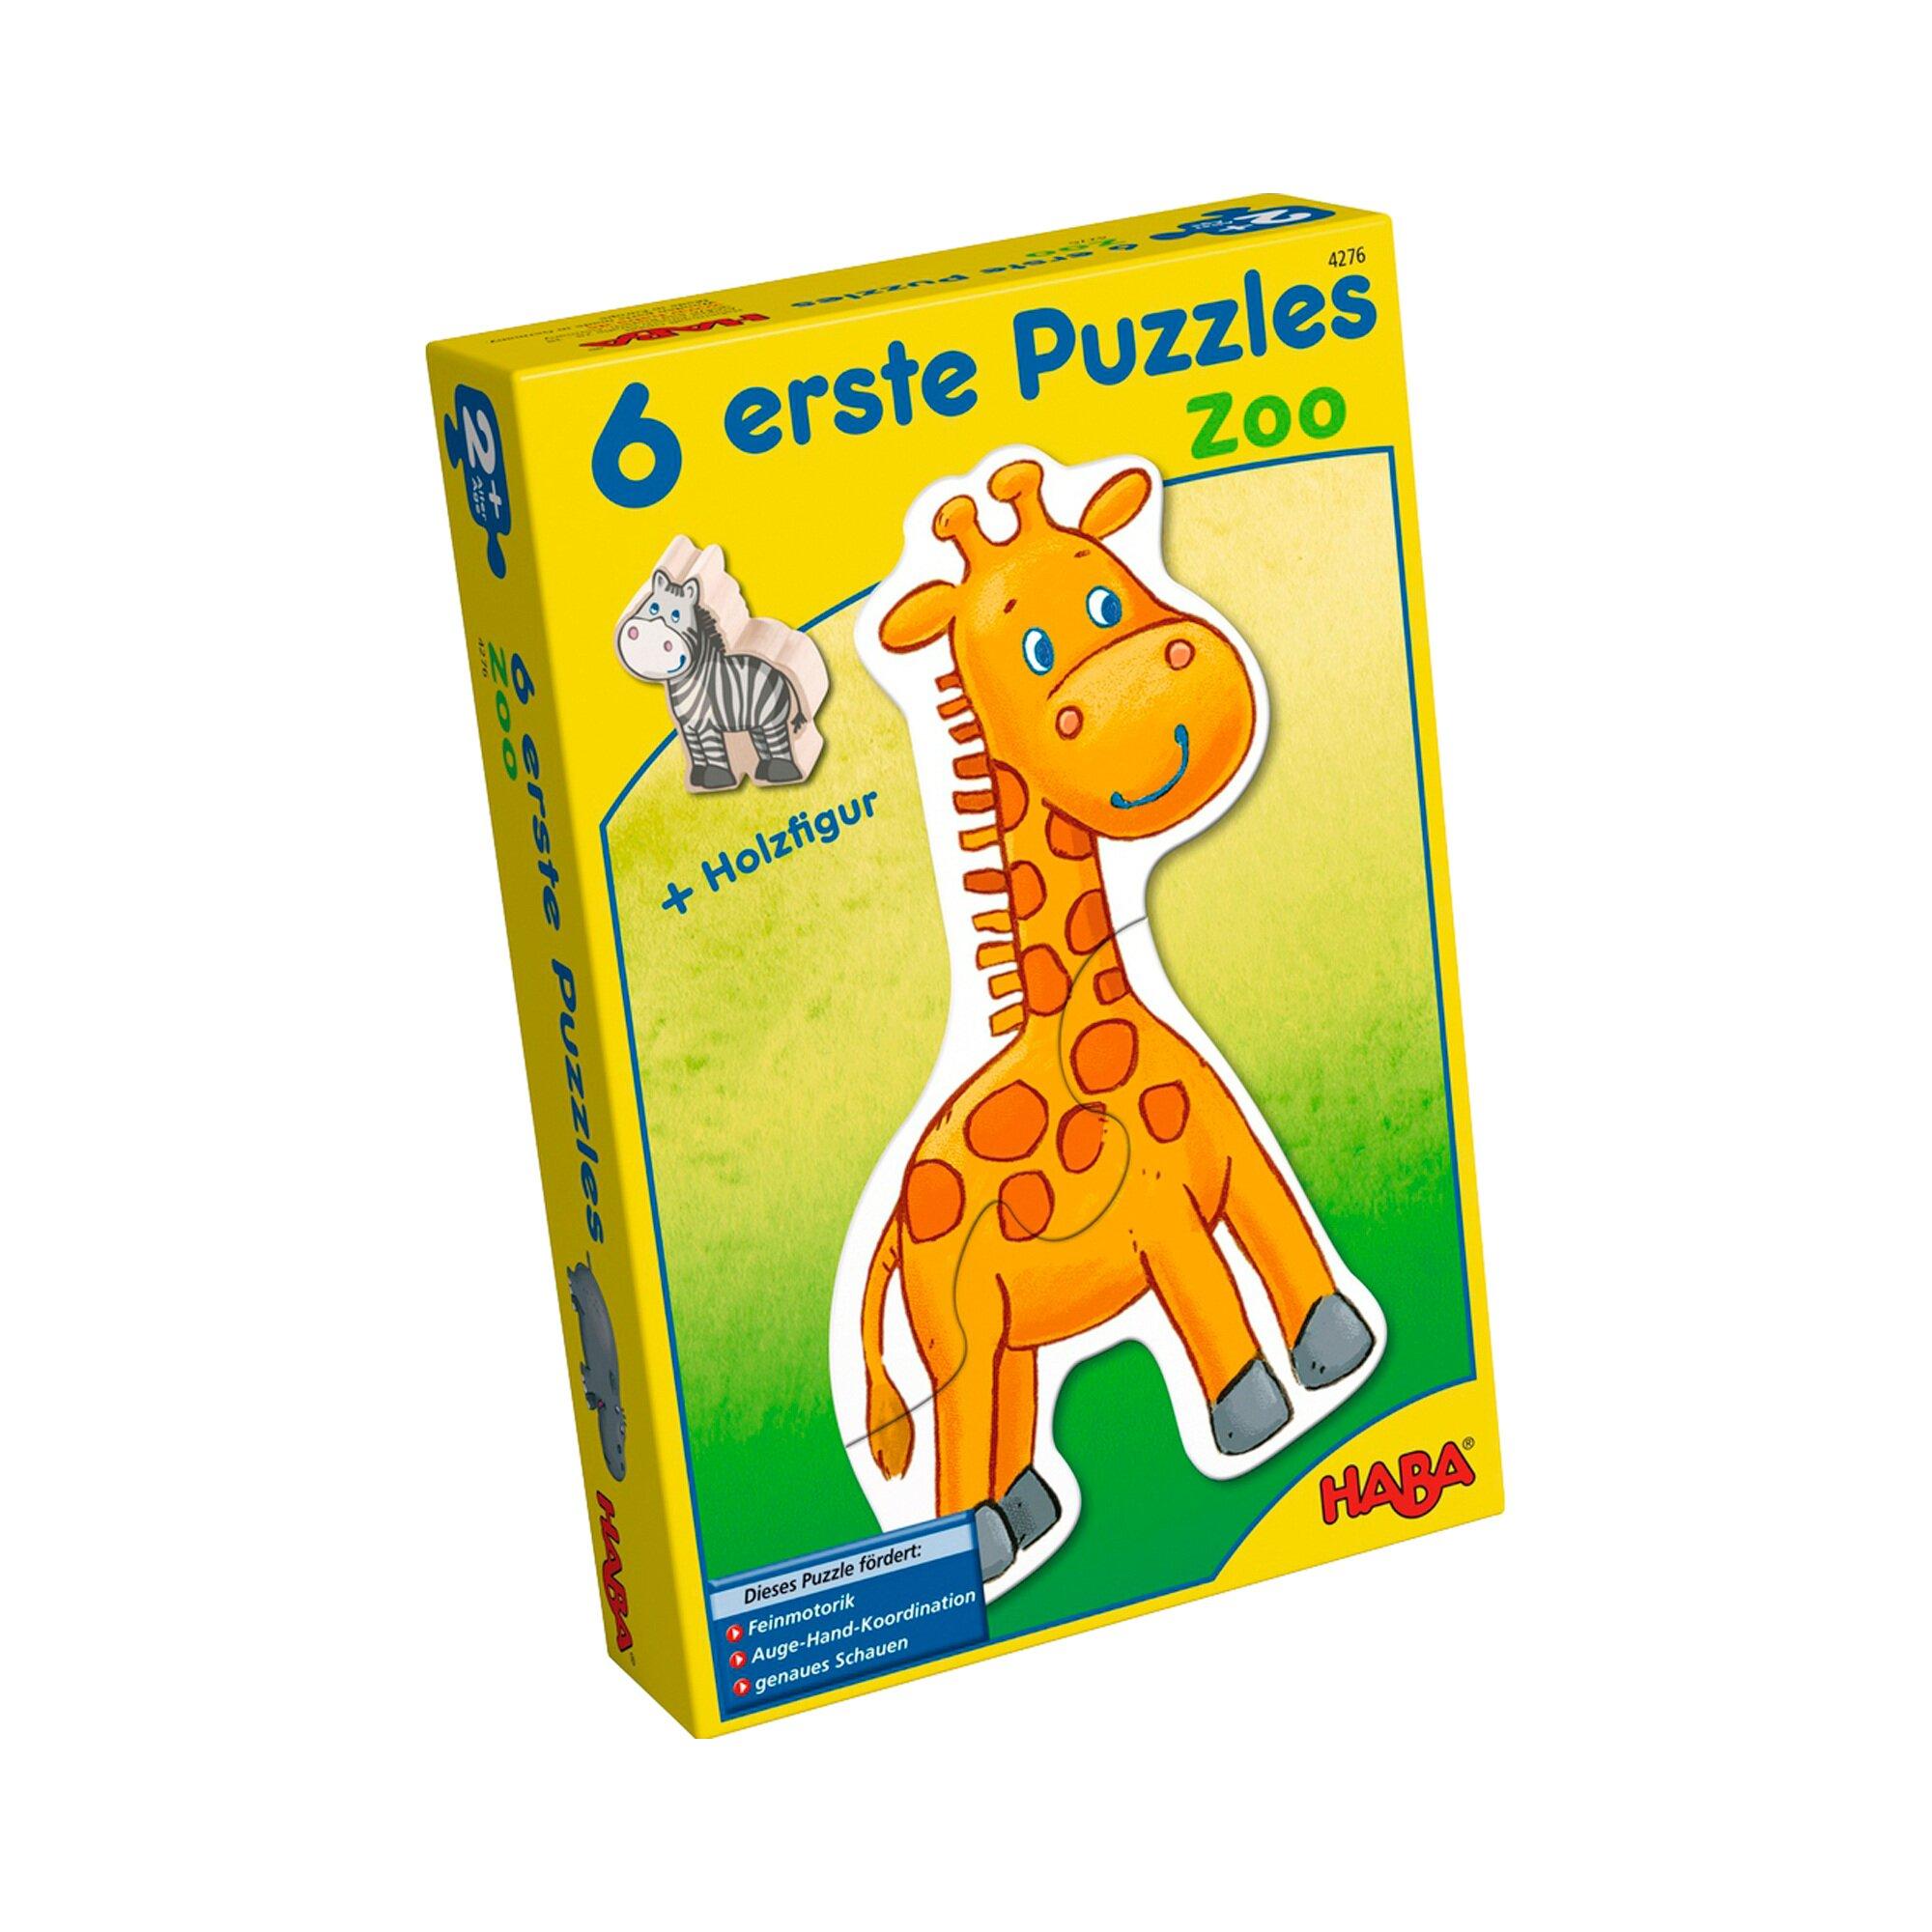 Haba 6 erste Puzzles Zoo